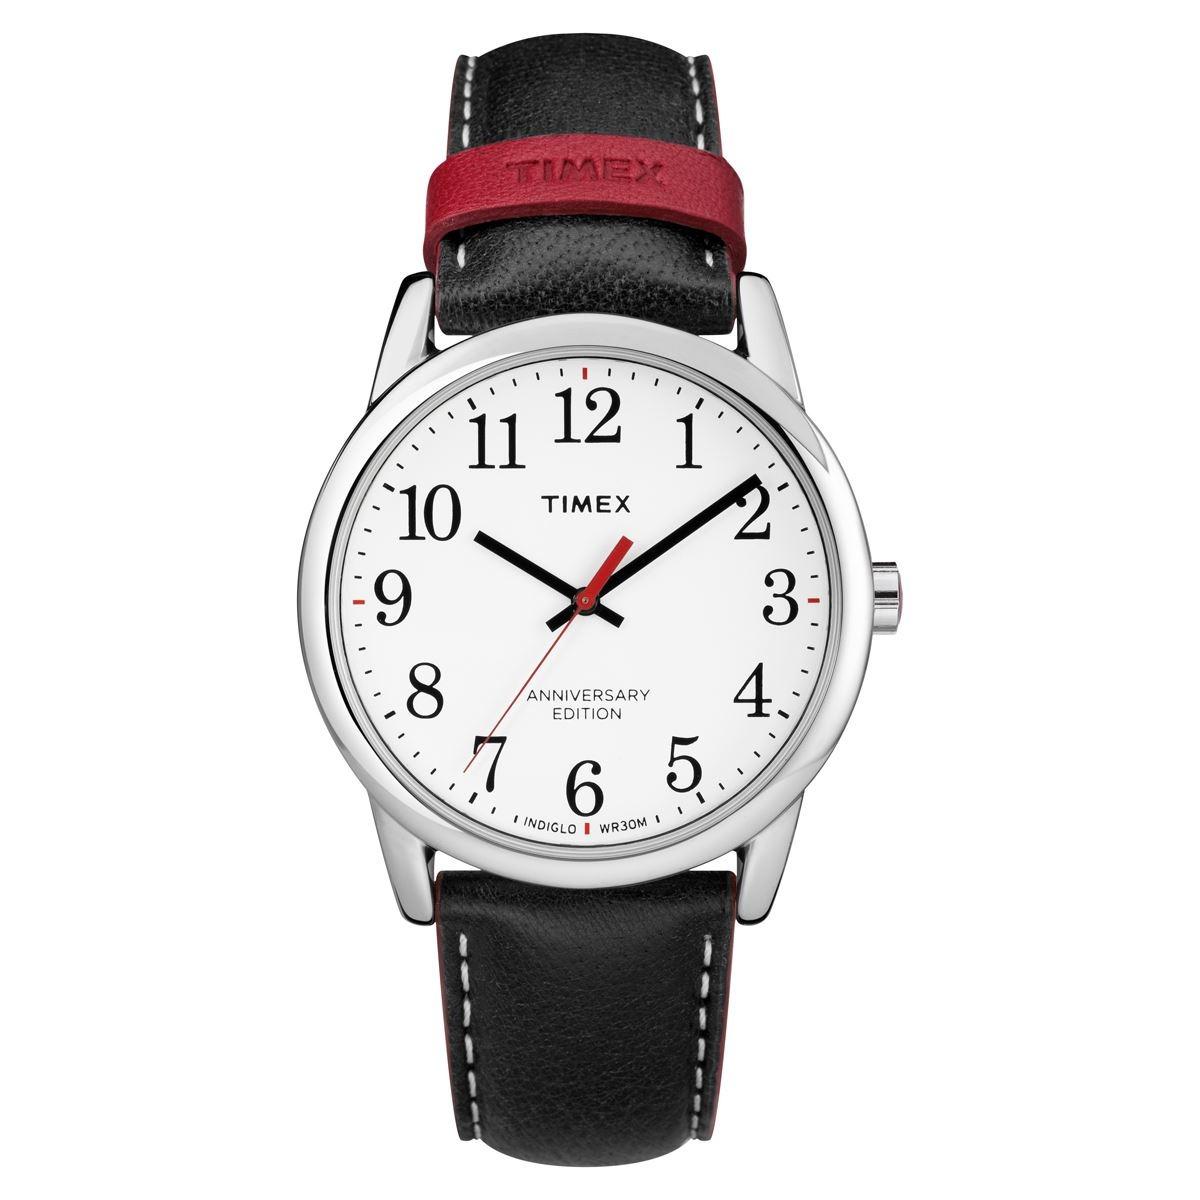 67c457583fc9 reloj timex tw2r40000 100% original para caballero. Cargando zoom.